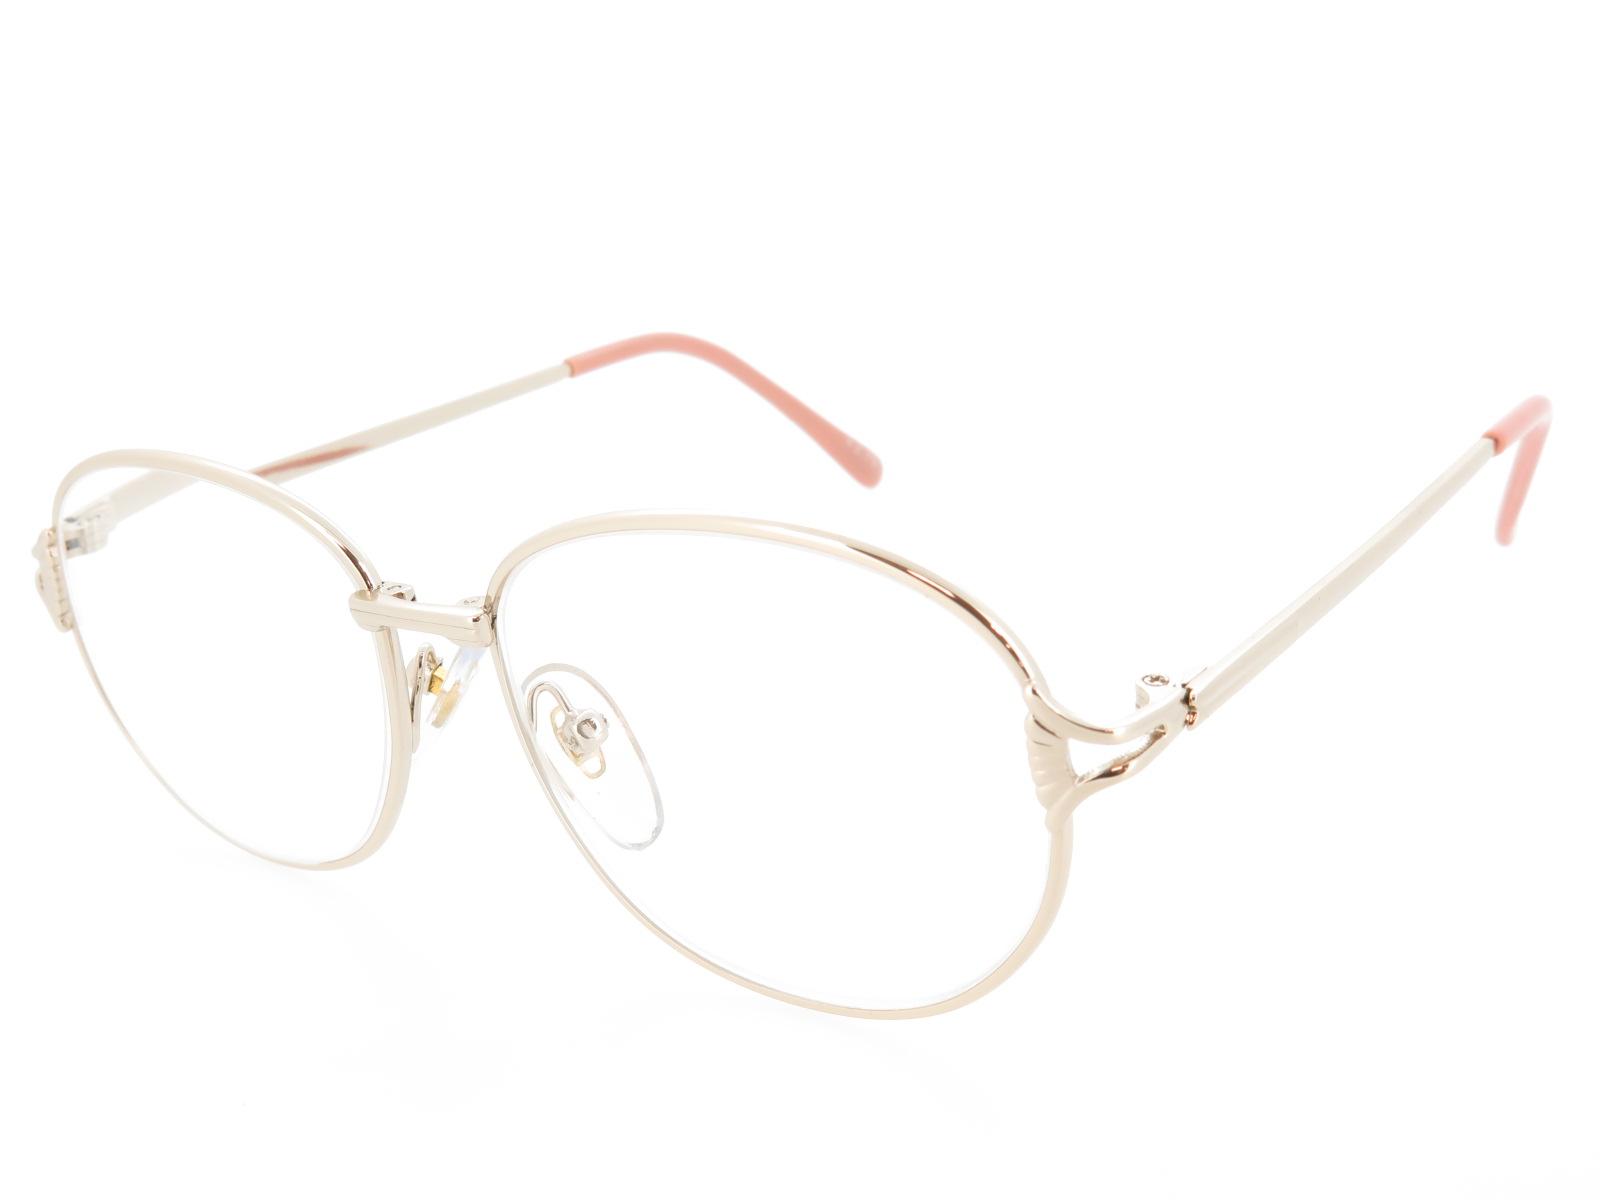 普通の老眼鏡 女性用